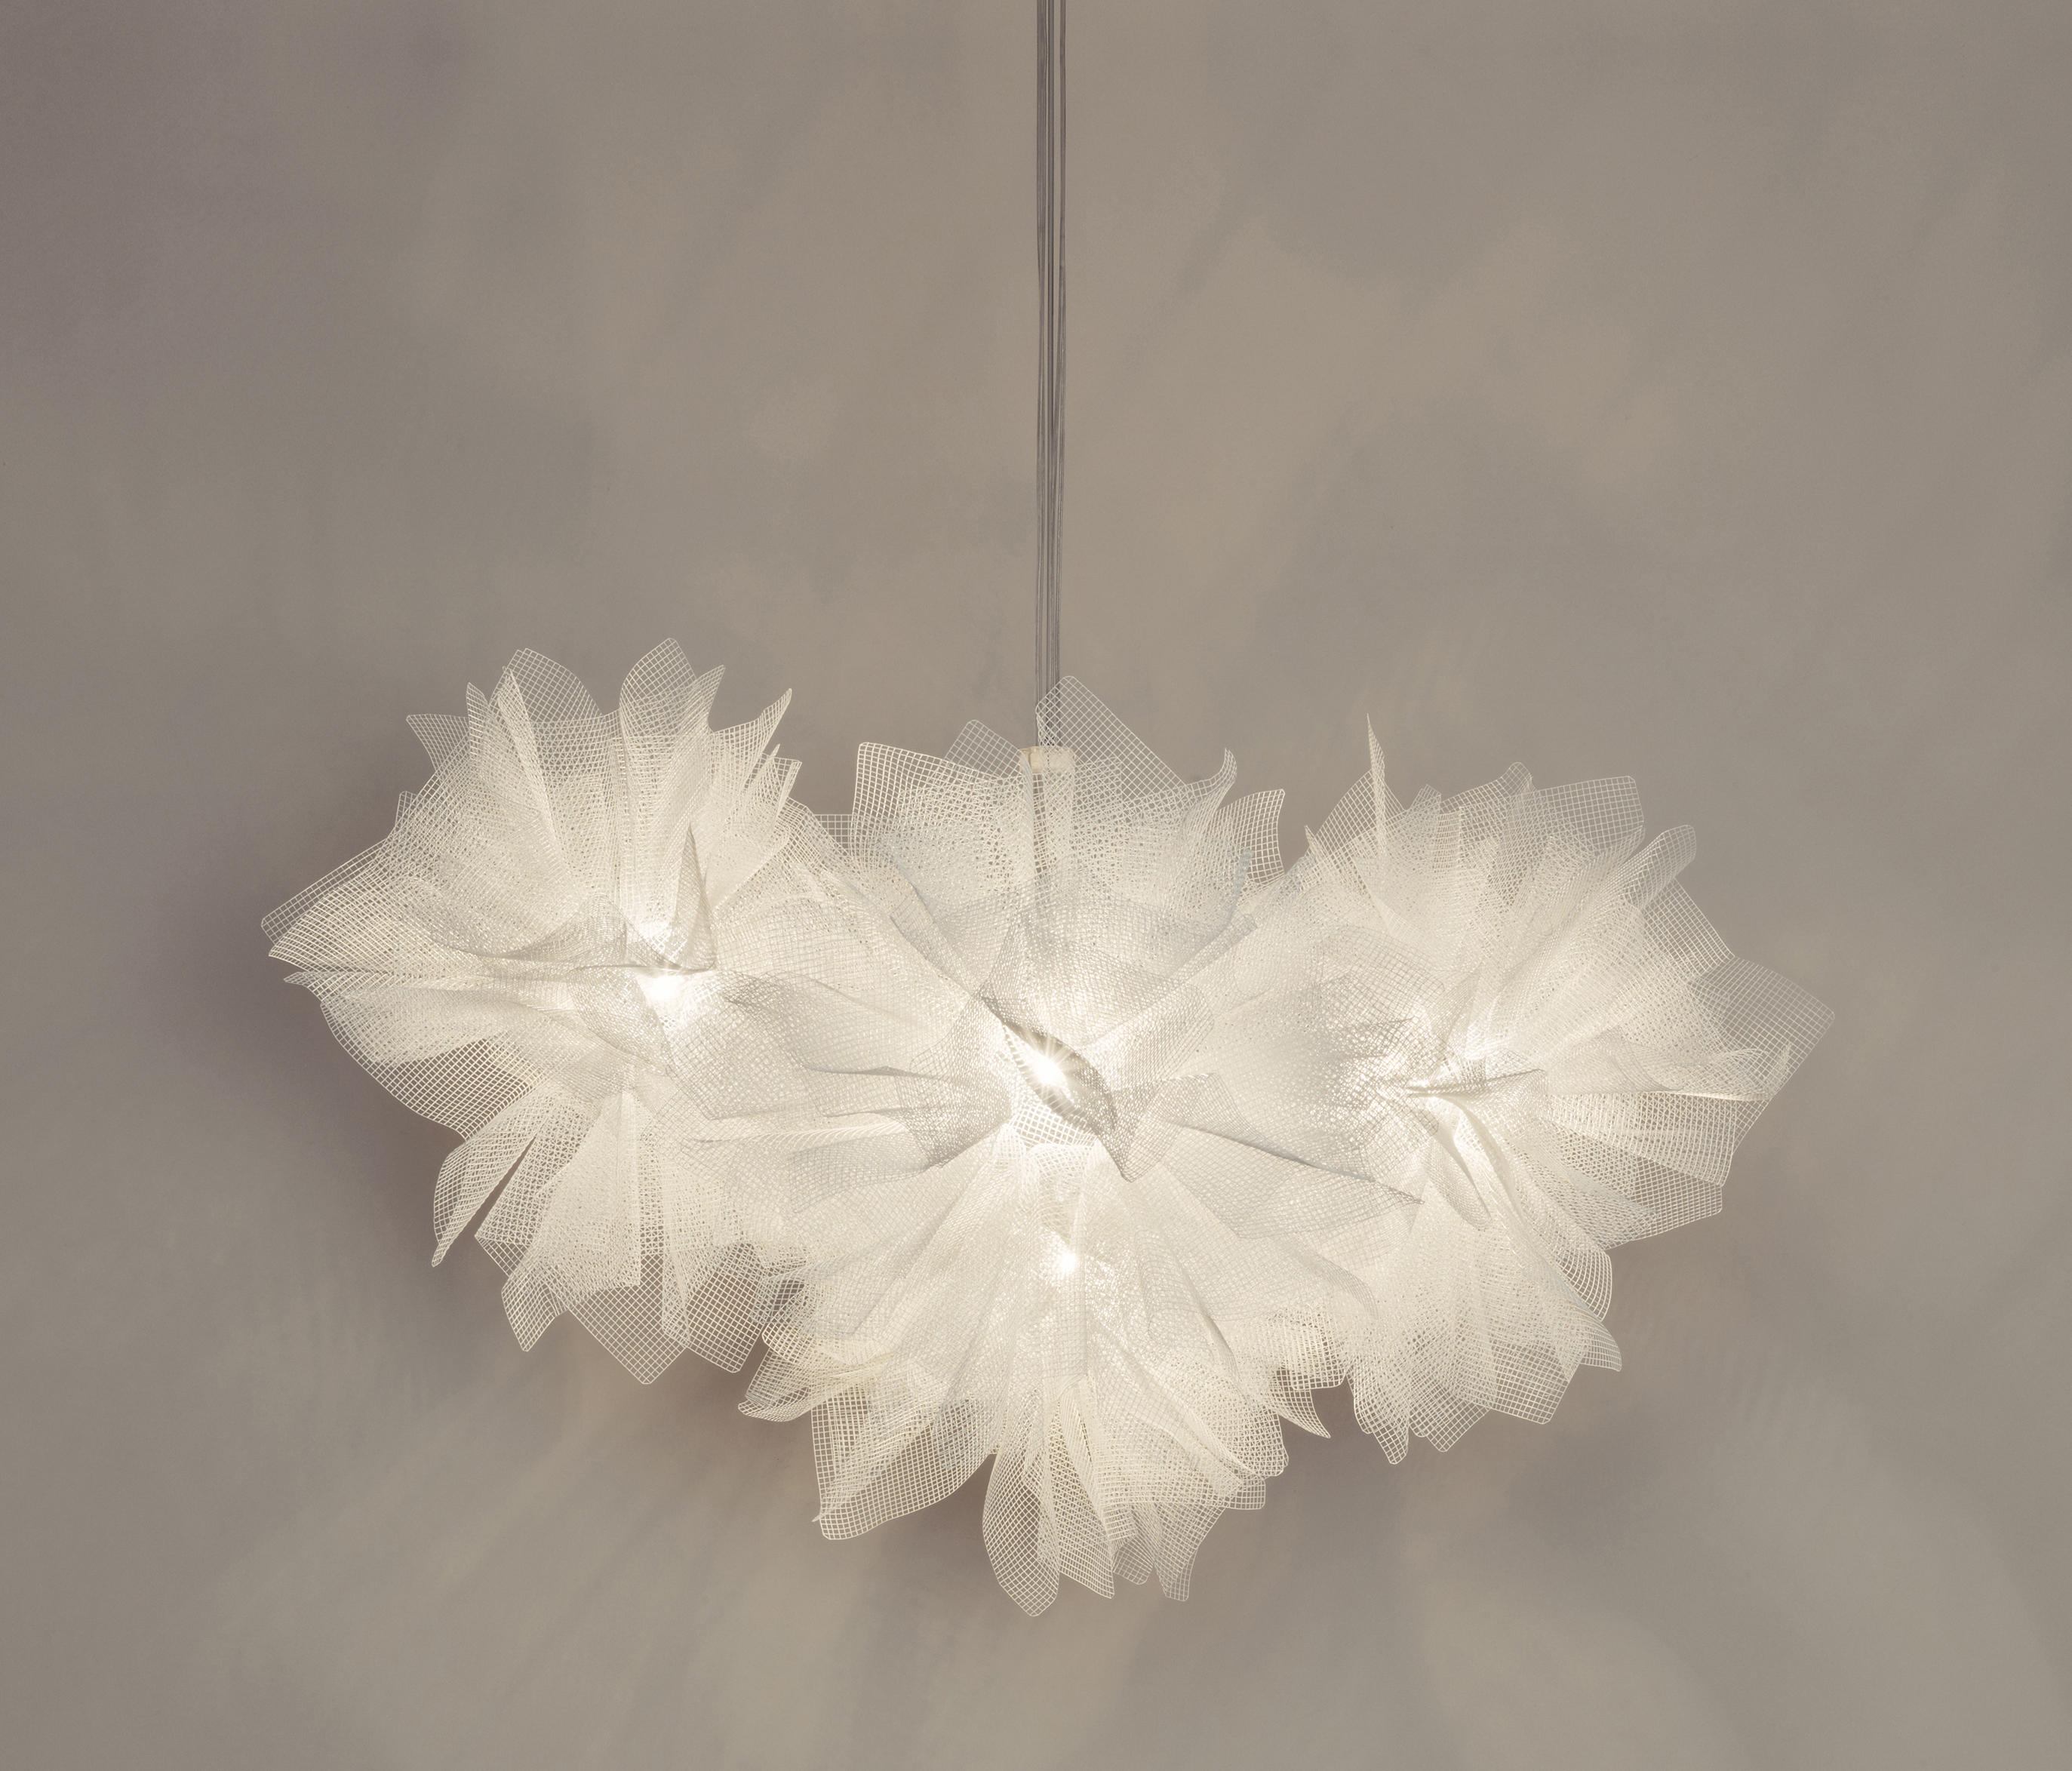 fluo fl04 4 suspended lights from arturo alvarez architonic